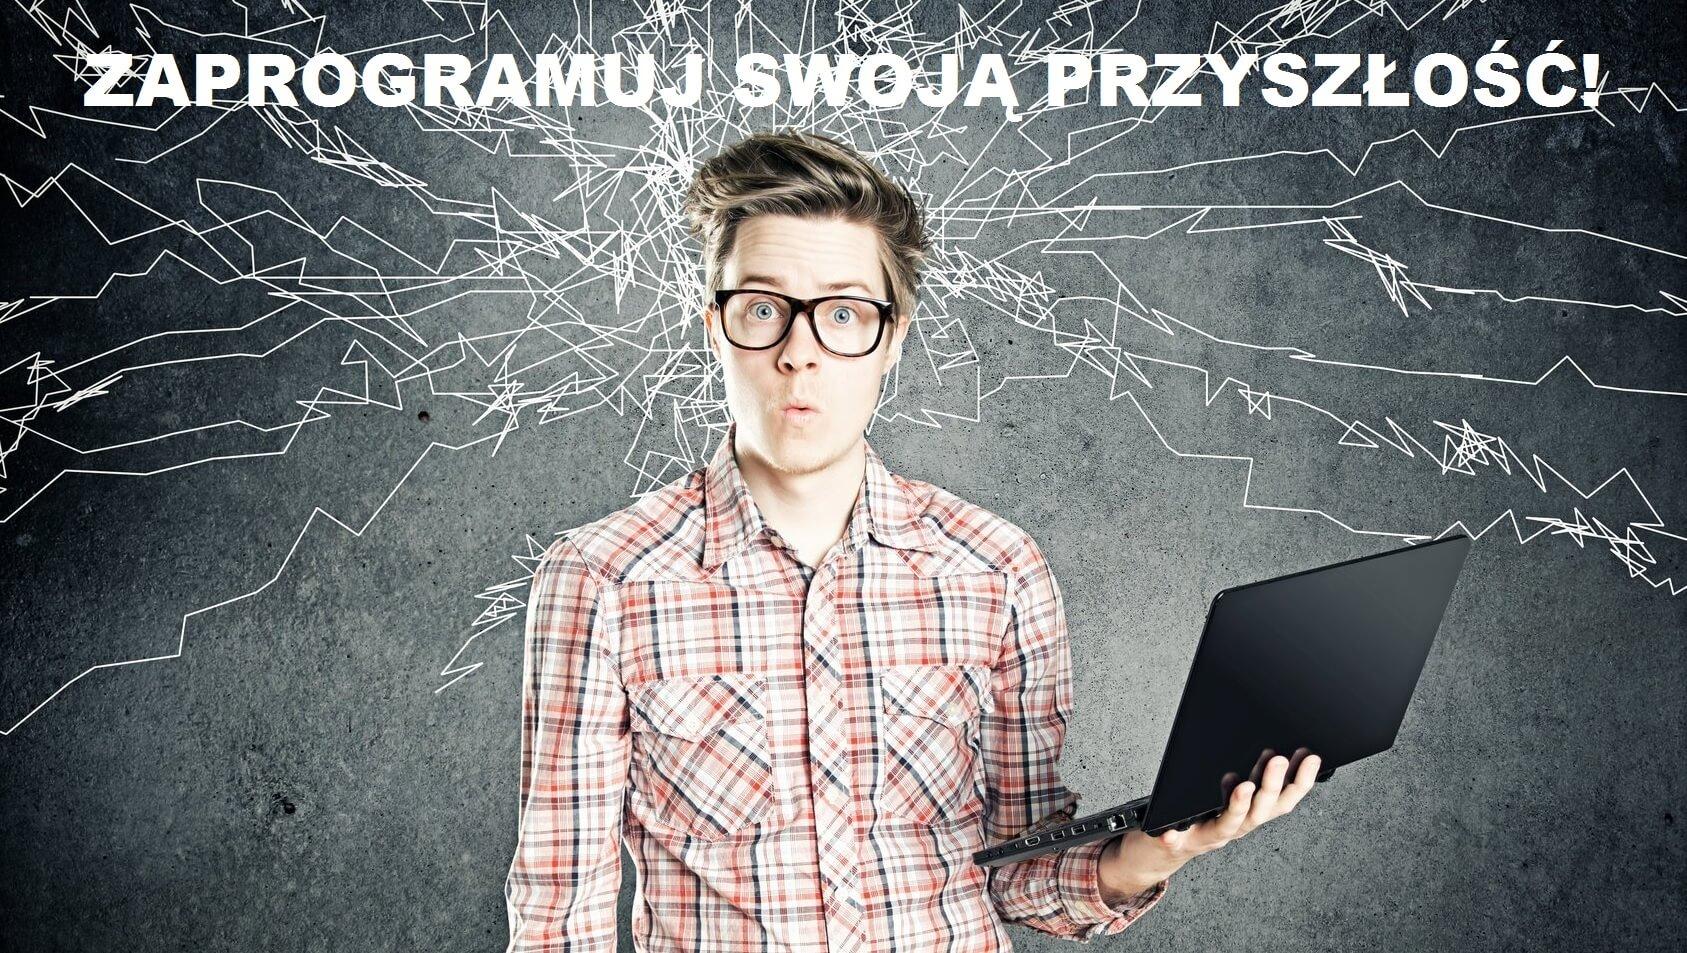 giganci_programowania_baner2